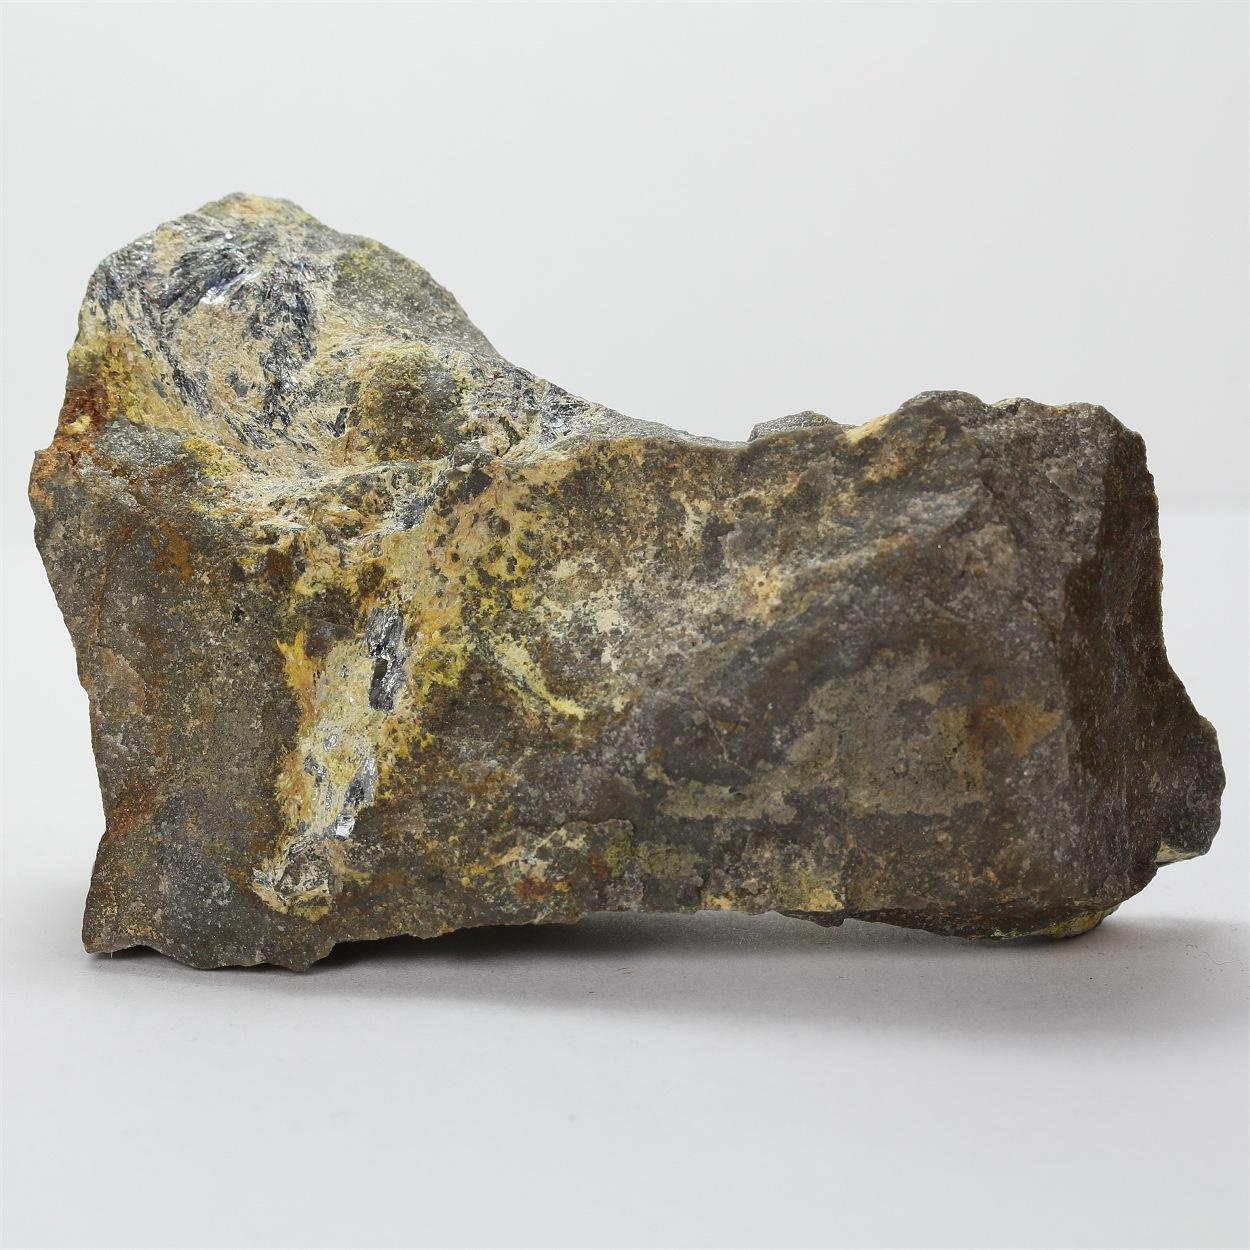 Antimony Ochre With Stibnite